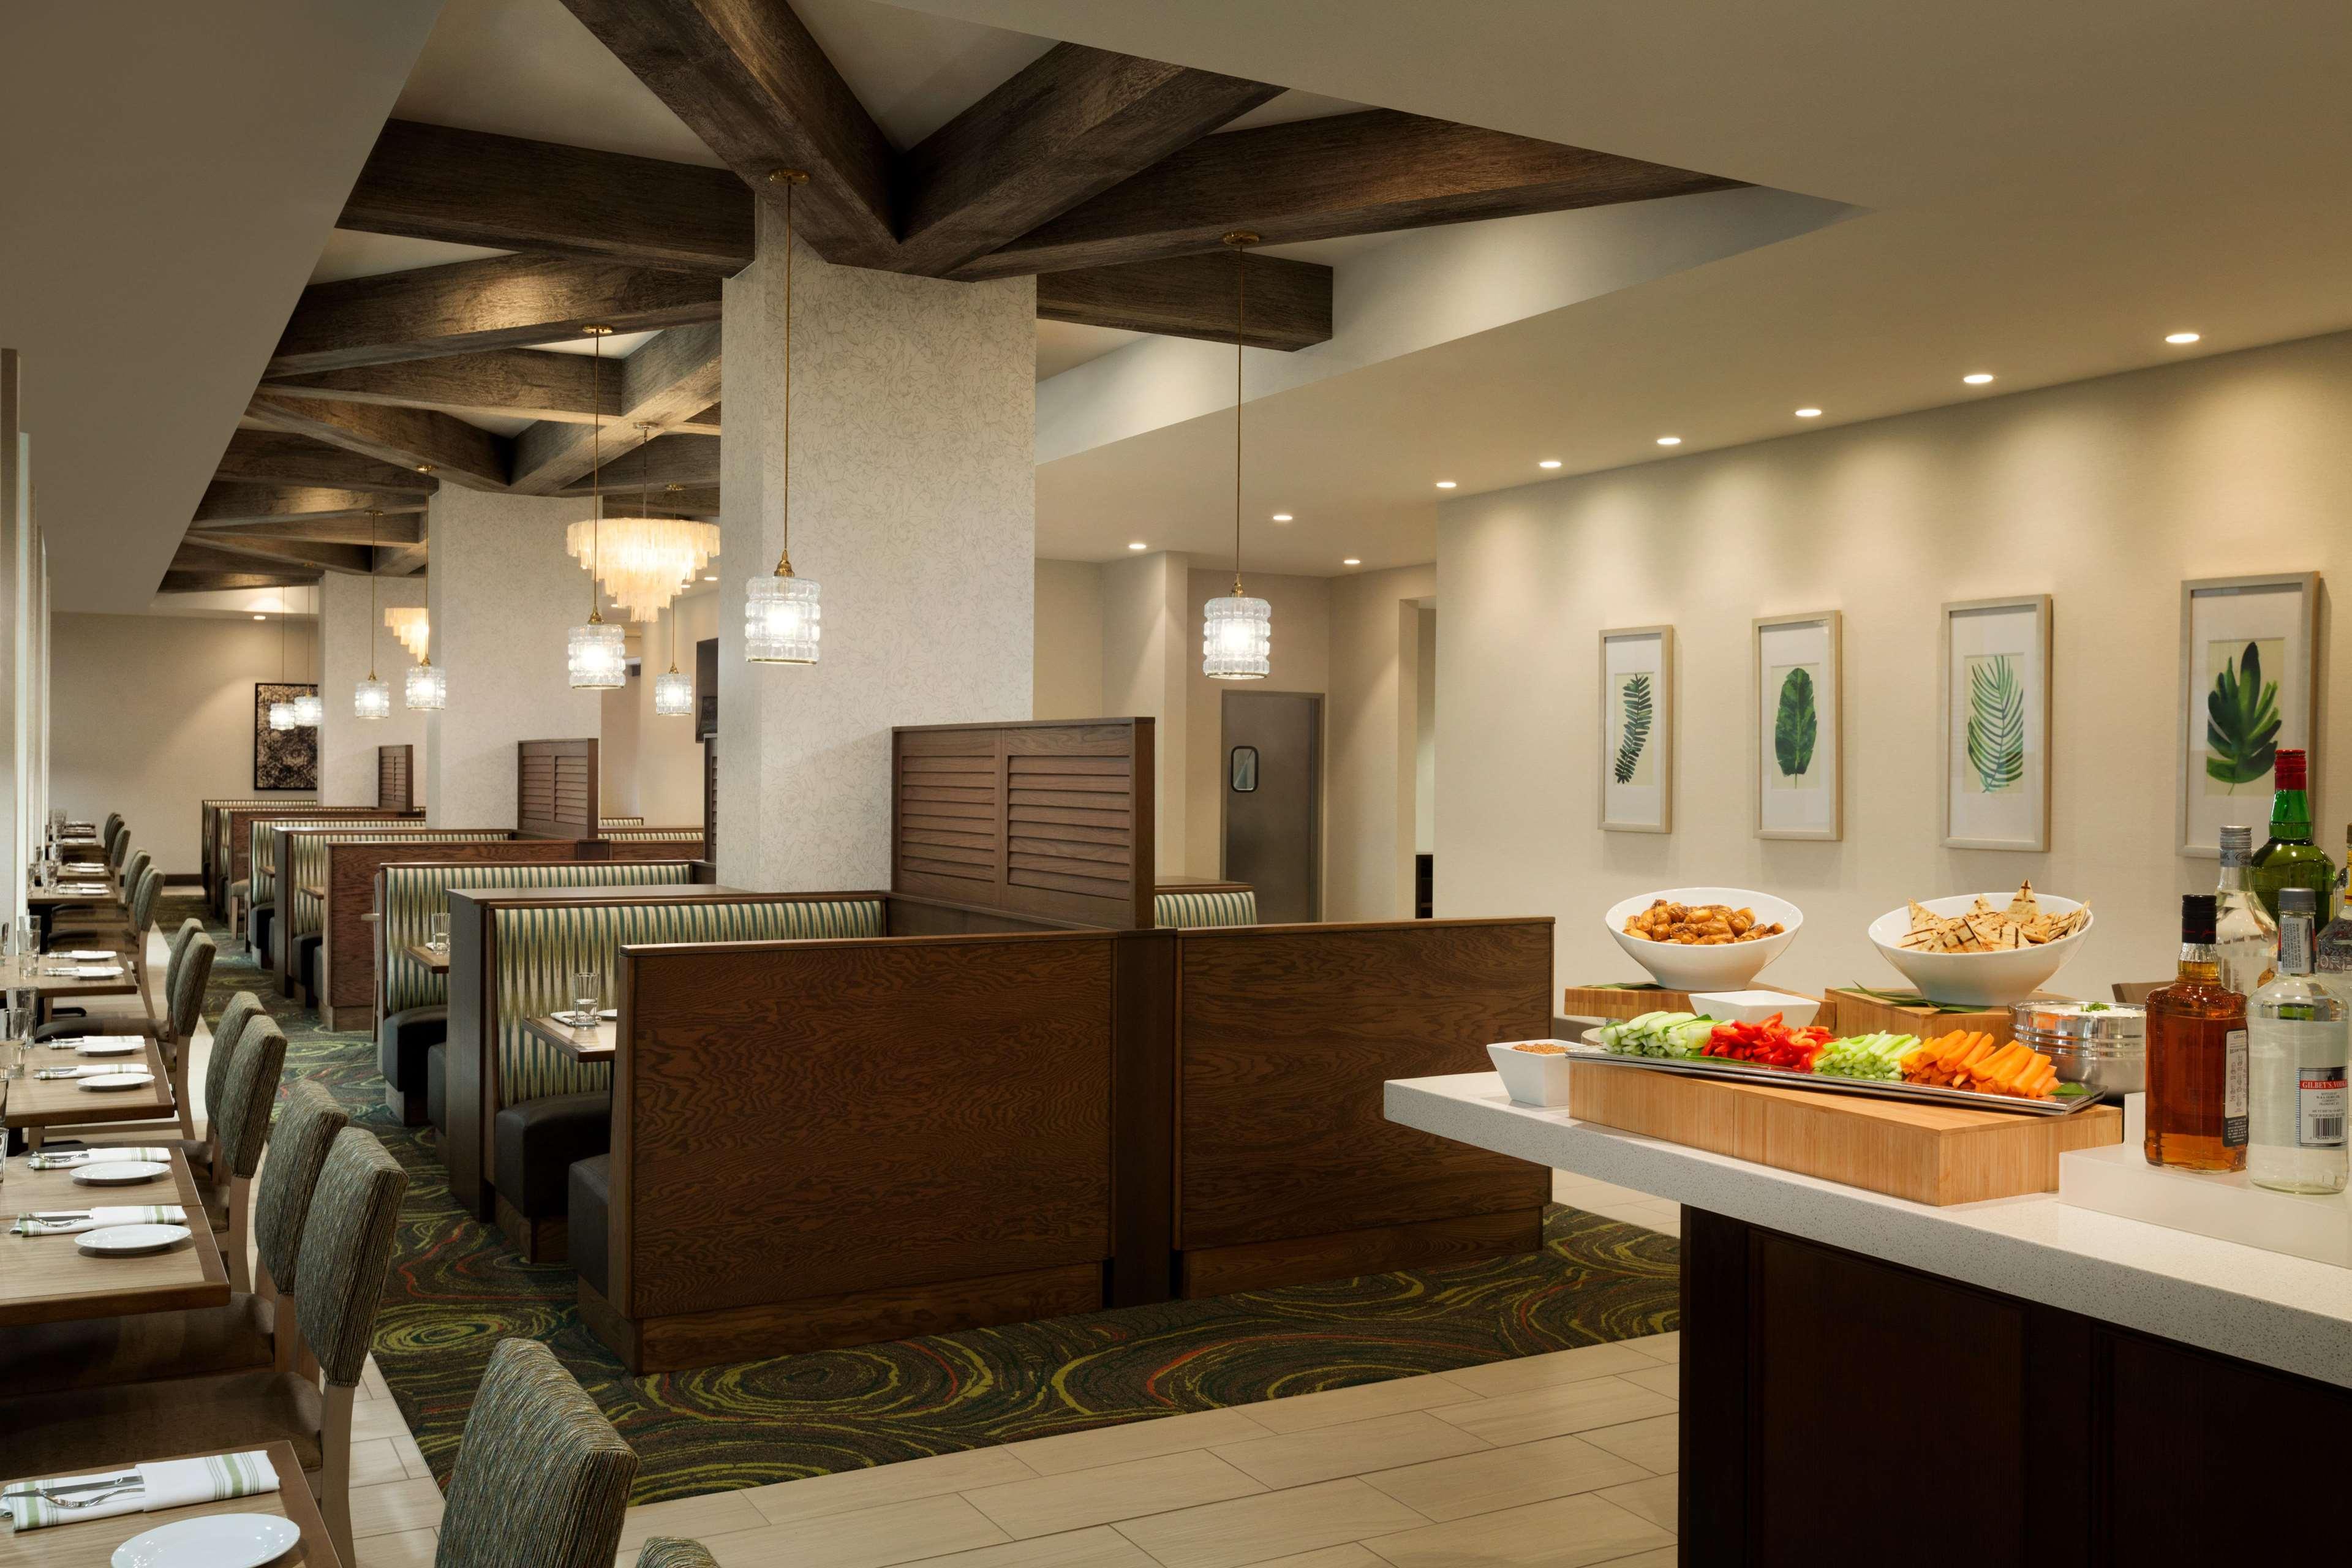 Embassy Suites by Hilton Oahu Kapolei image 13